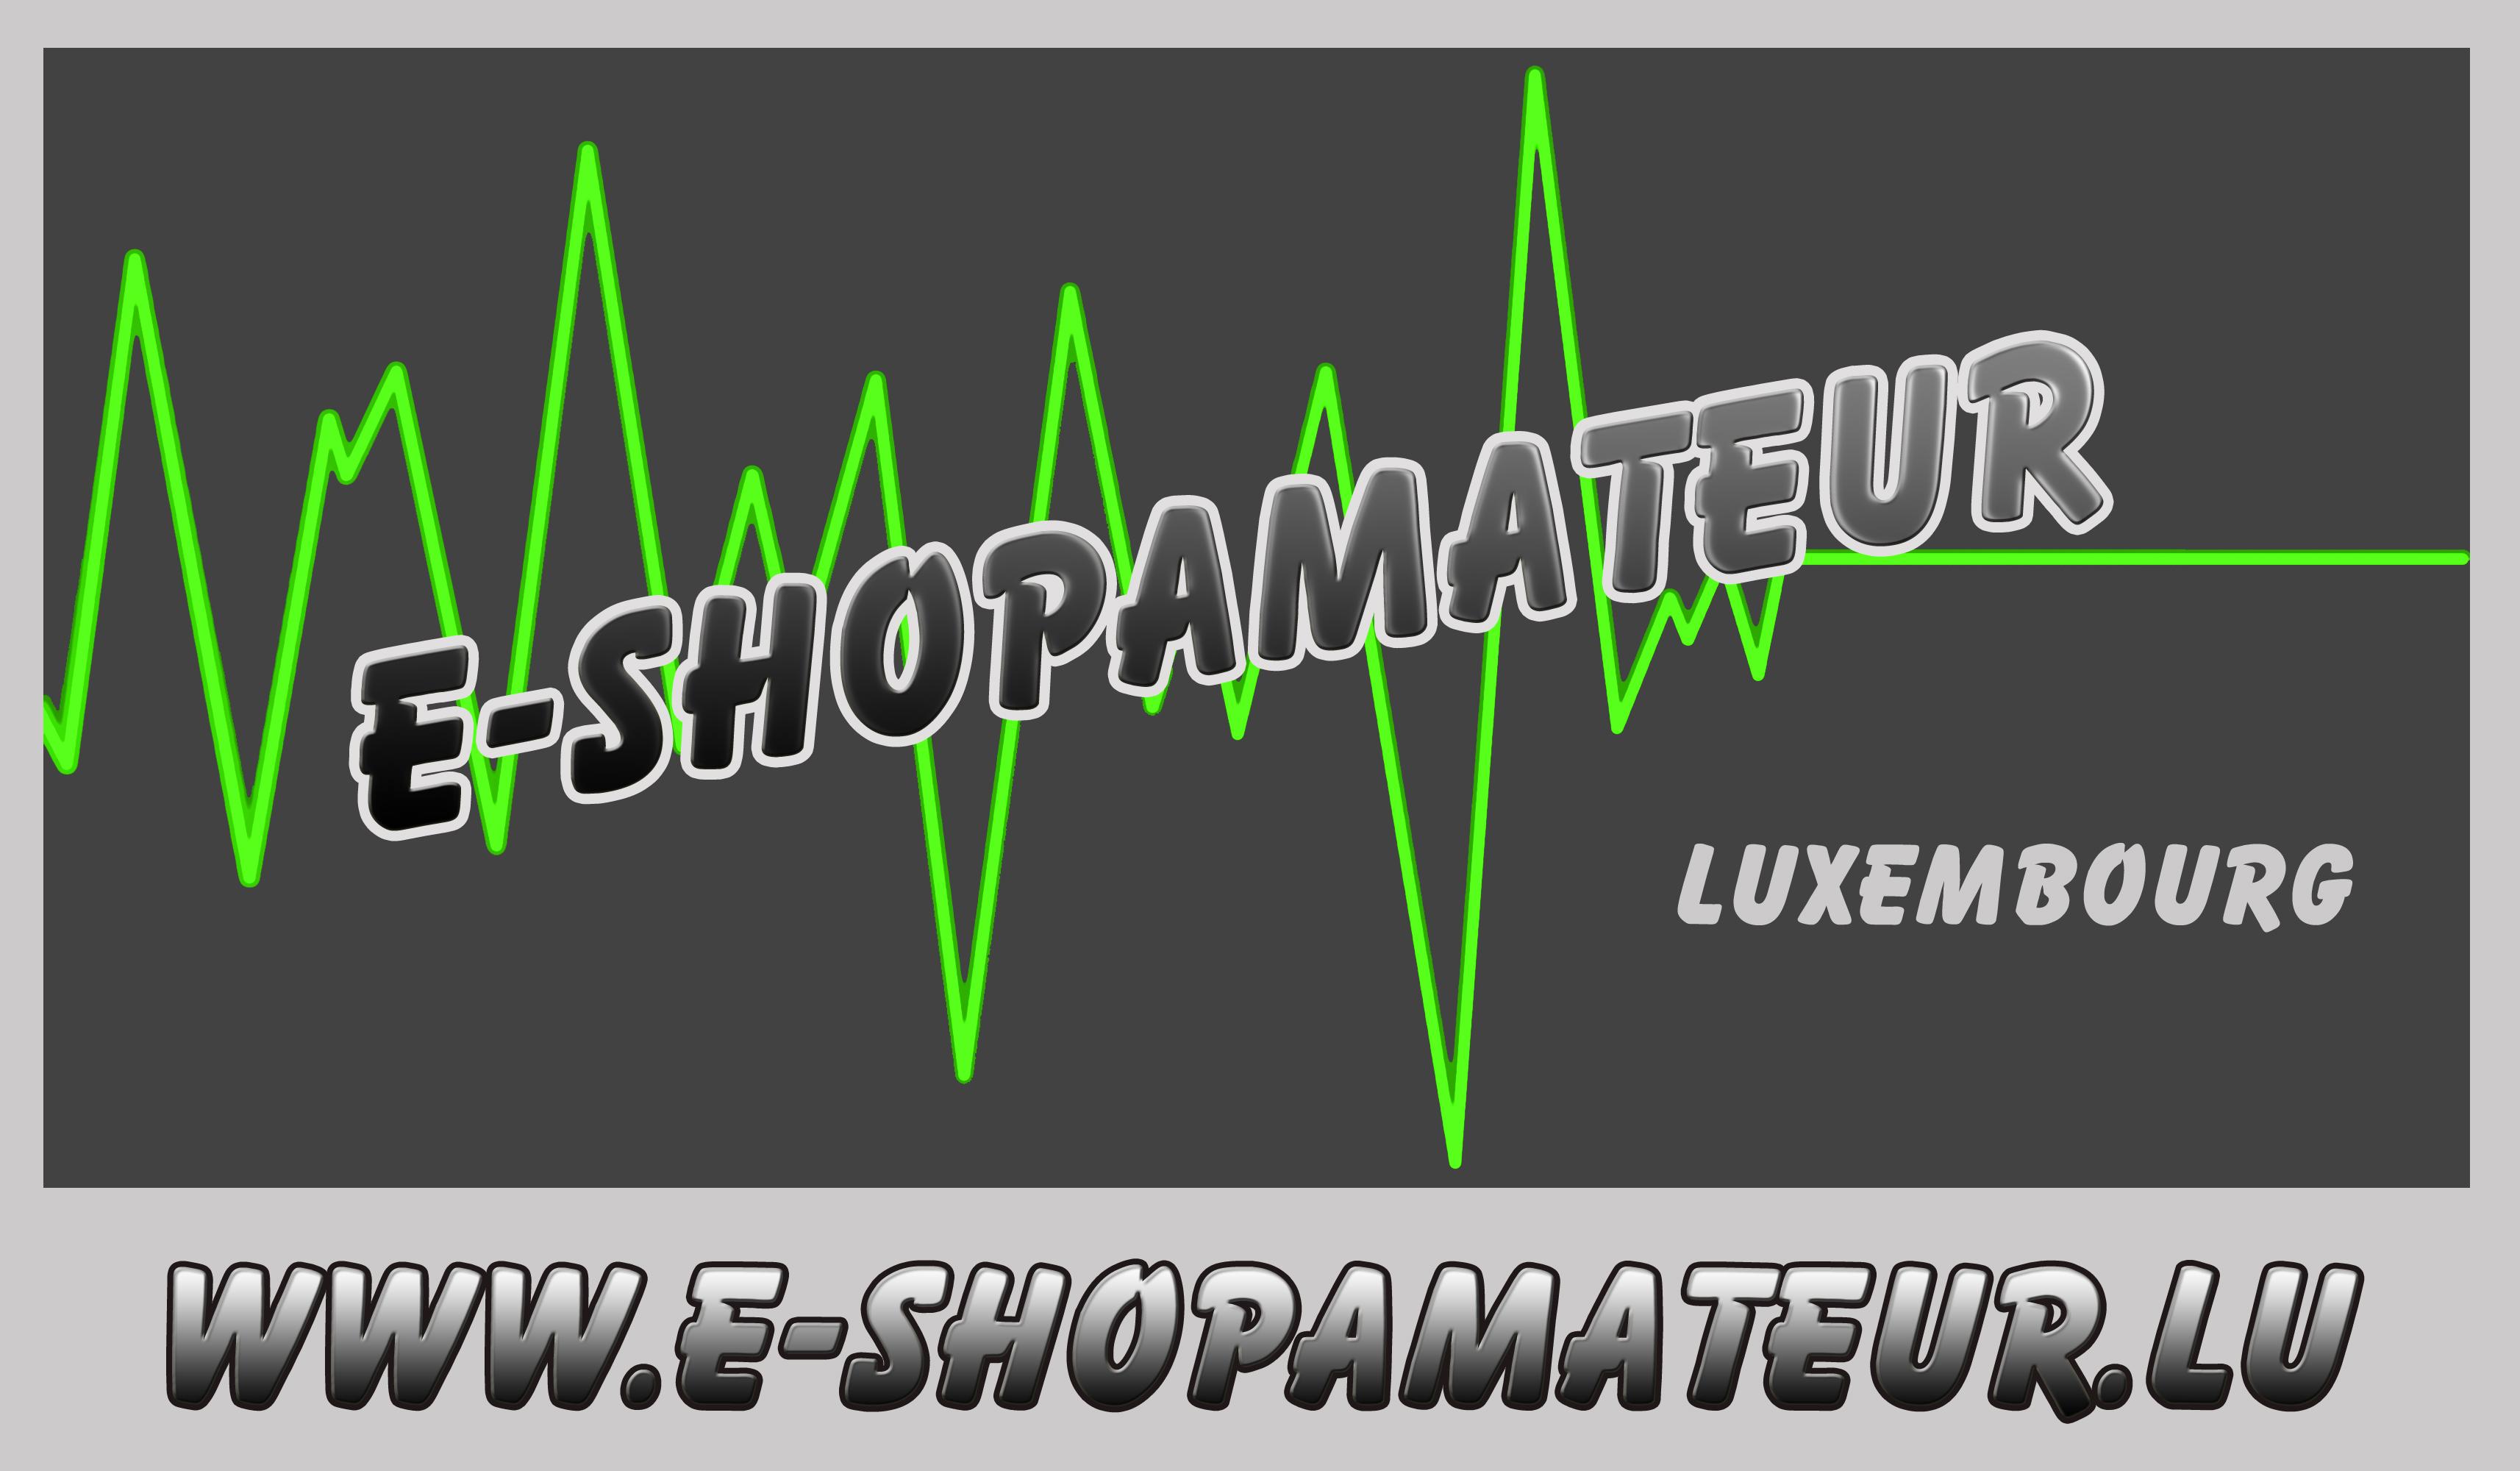 e-shopamateur